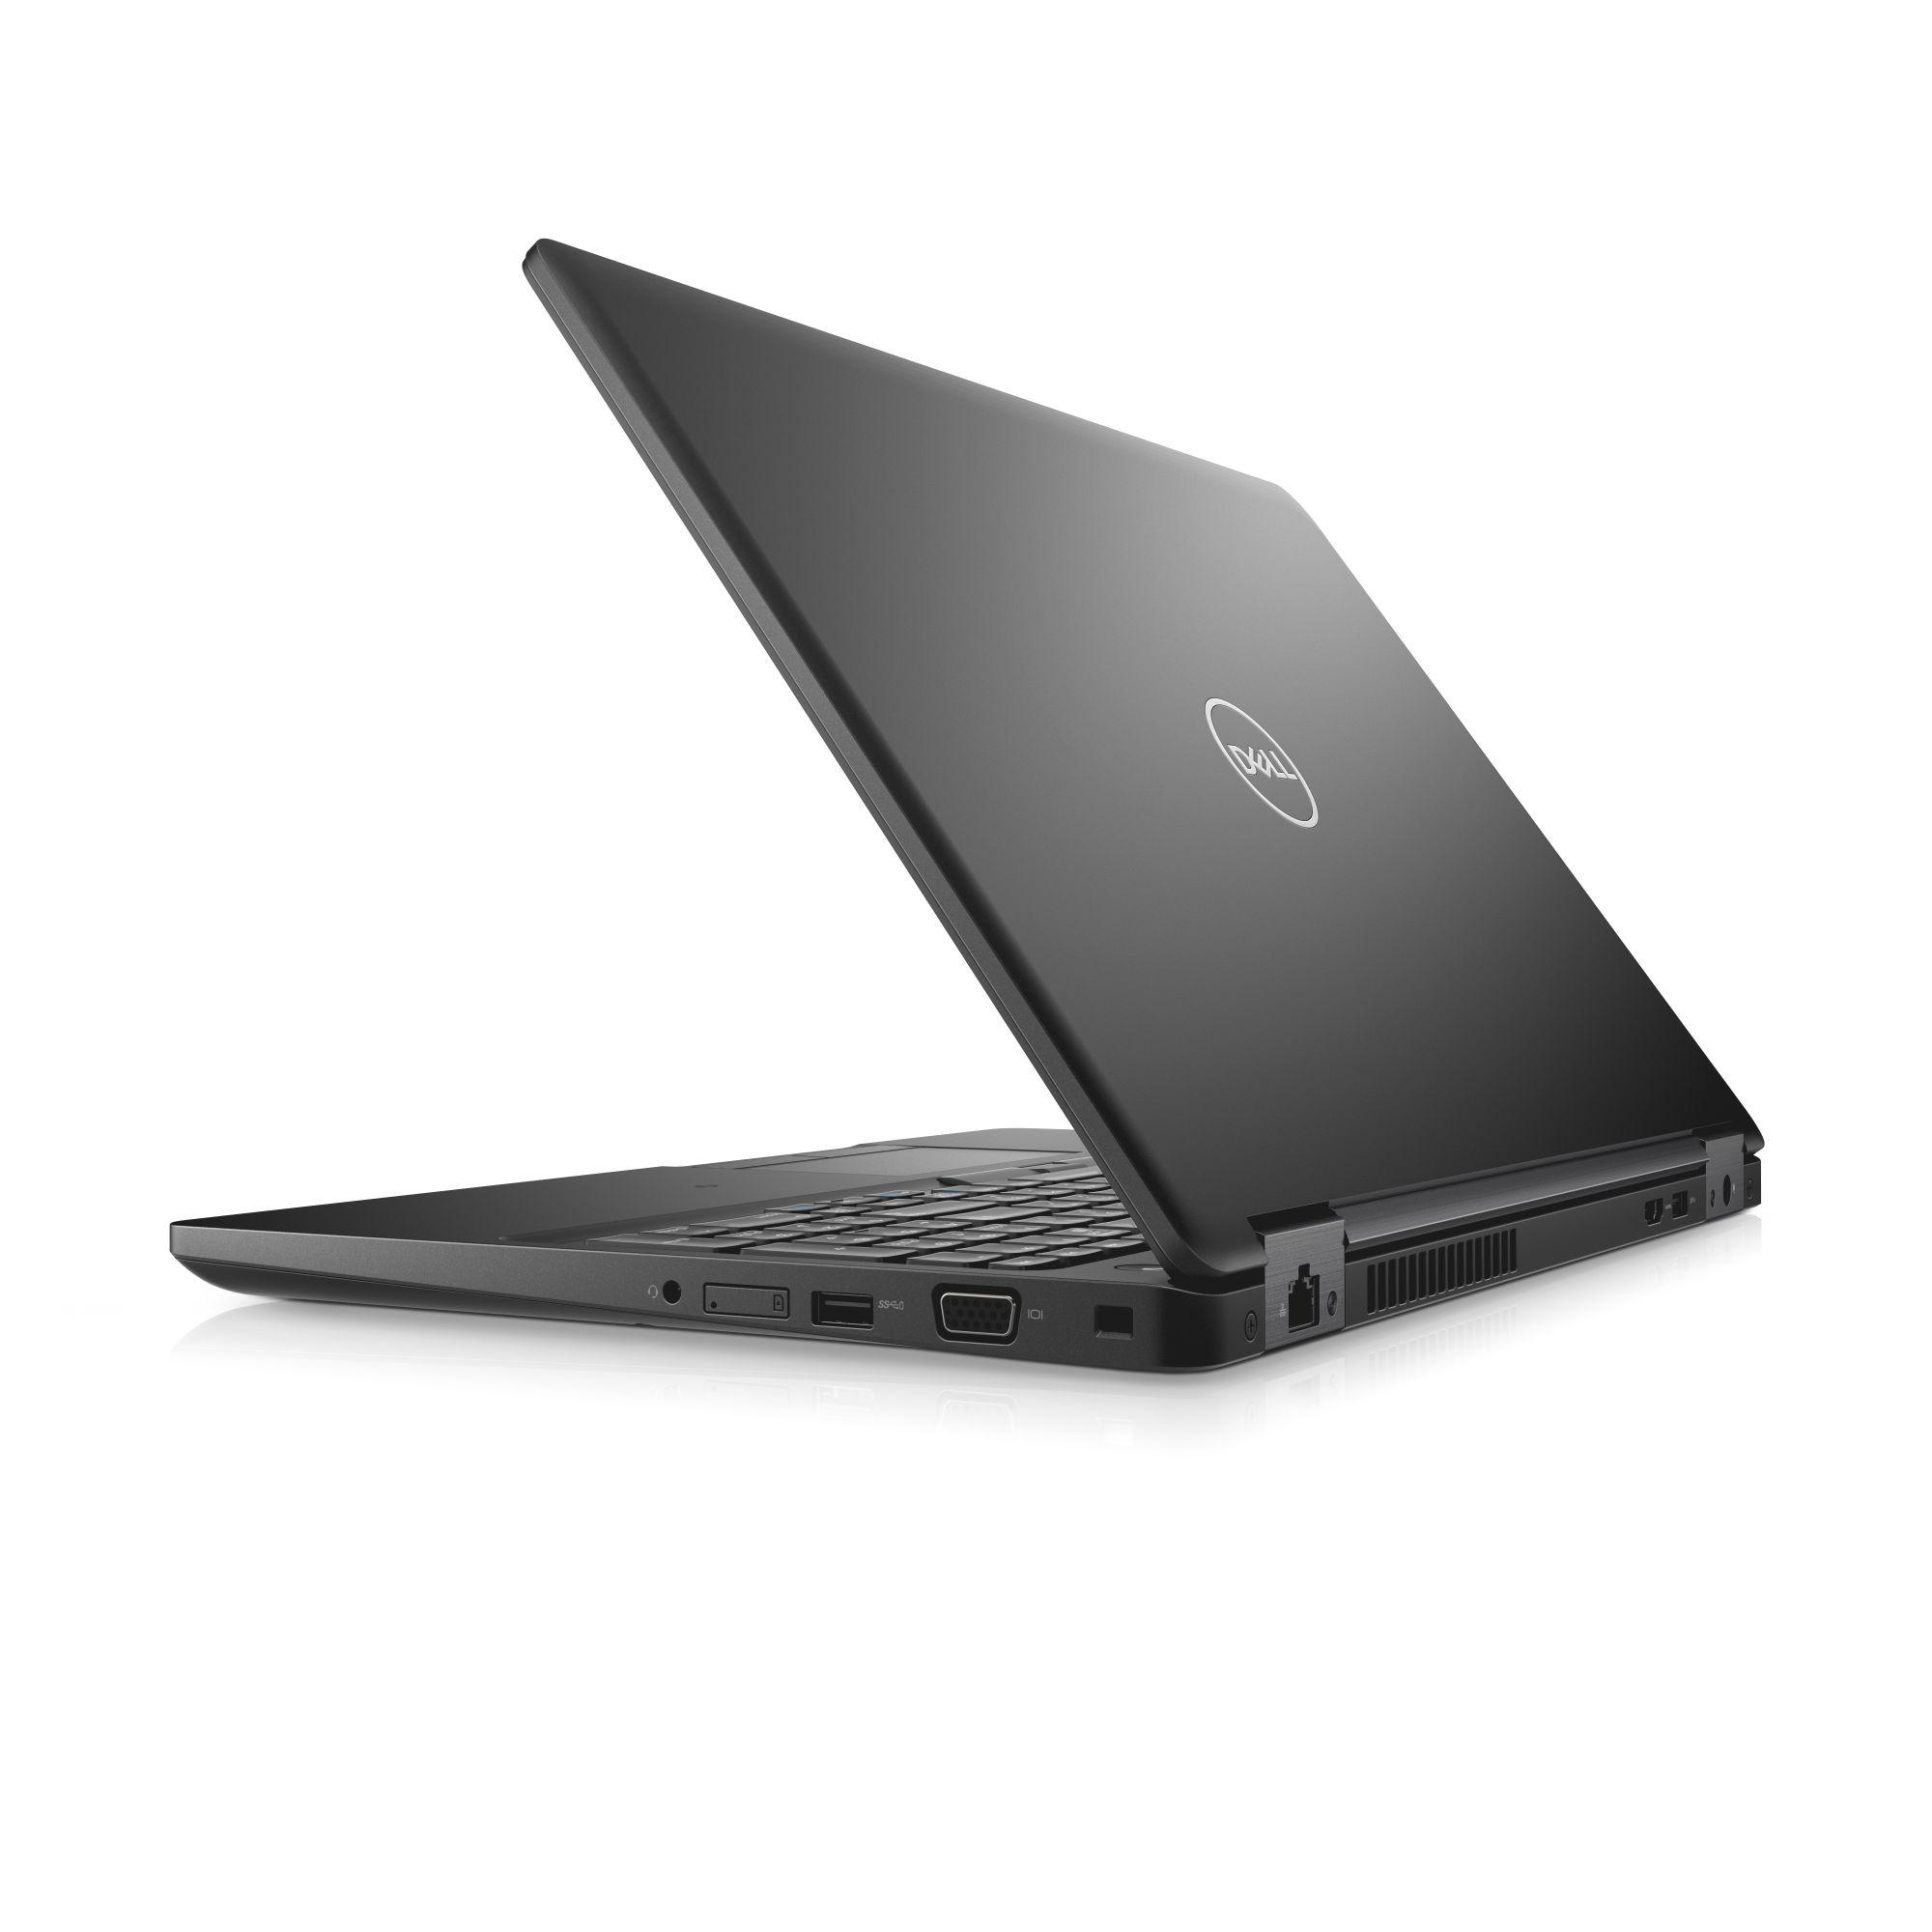 "Dell Latitude 5591 15"" FHD i5-8300H/8GB/256SSD+1TB/SCR/MCR/USB-C/HDMI/VGA/W10P/3RNBD/Černý"